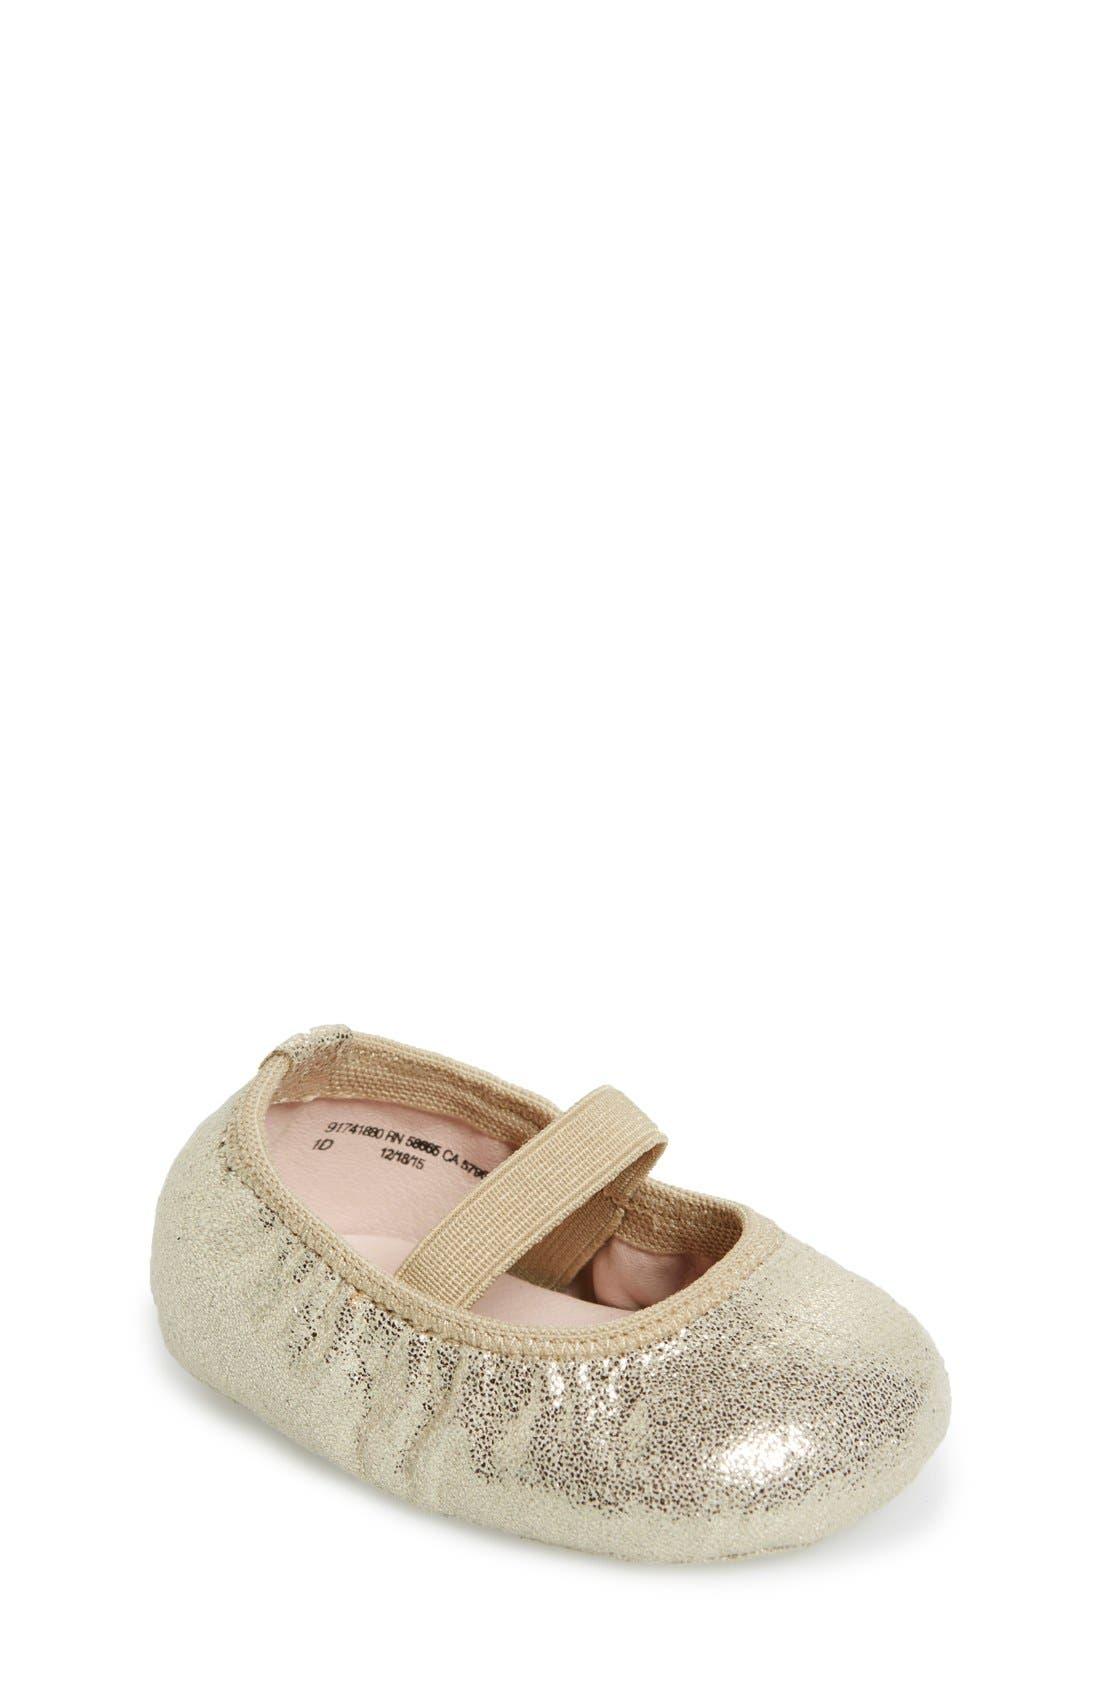 'Josie' Crib Shoe,                             Main thumbnail 1, color,